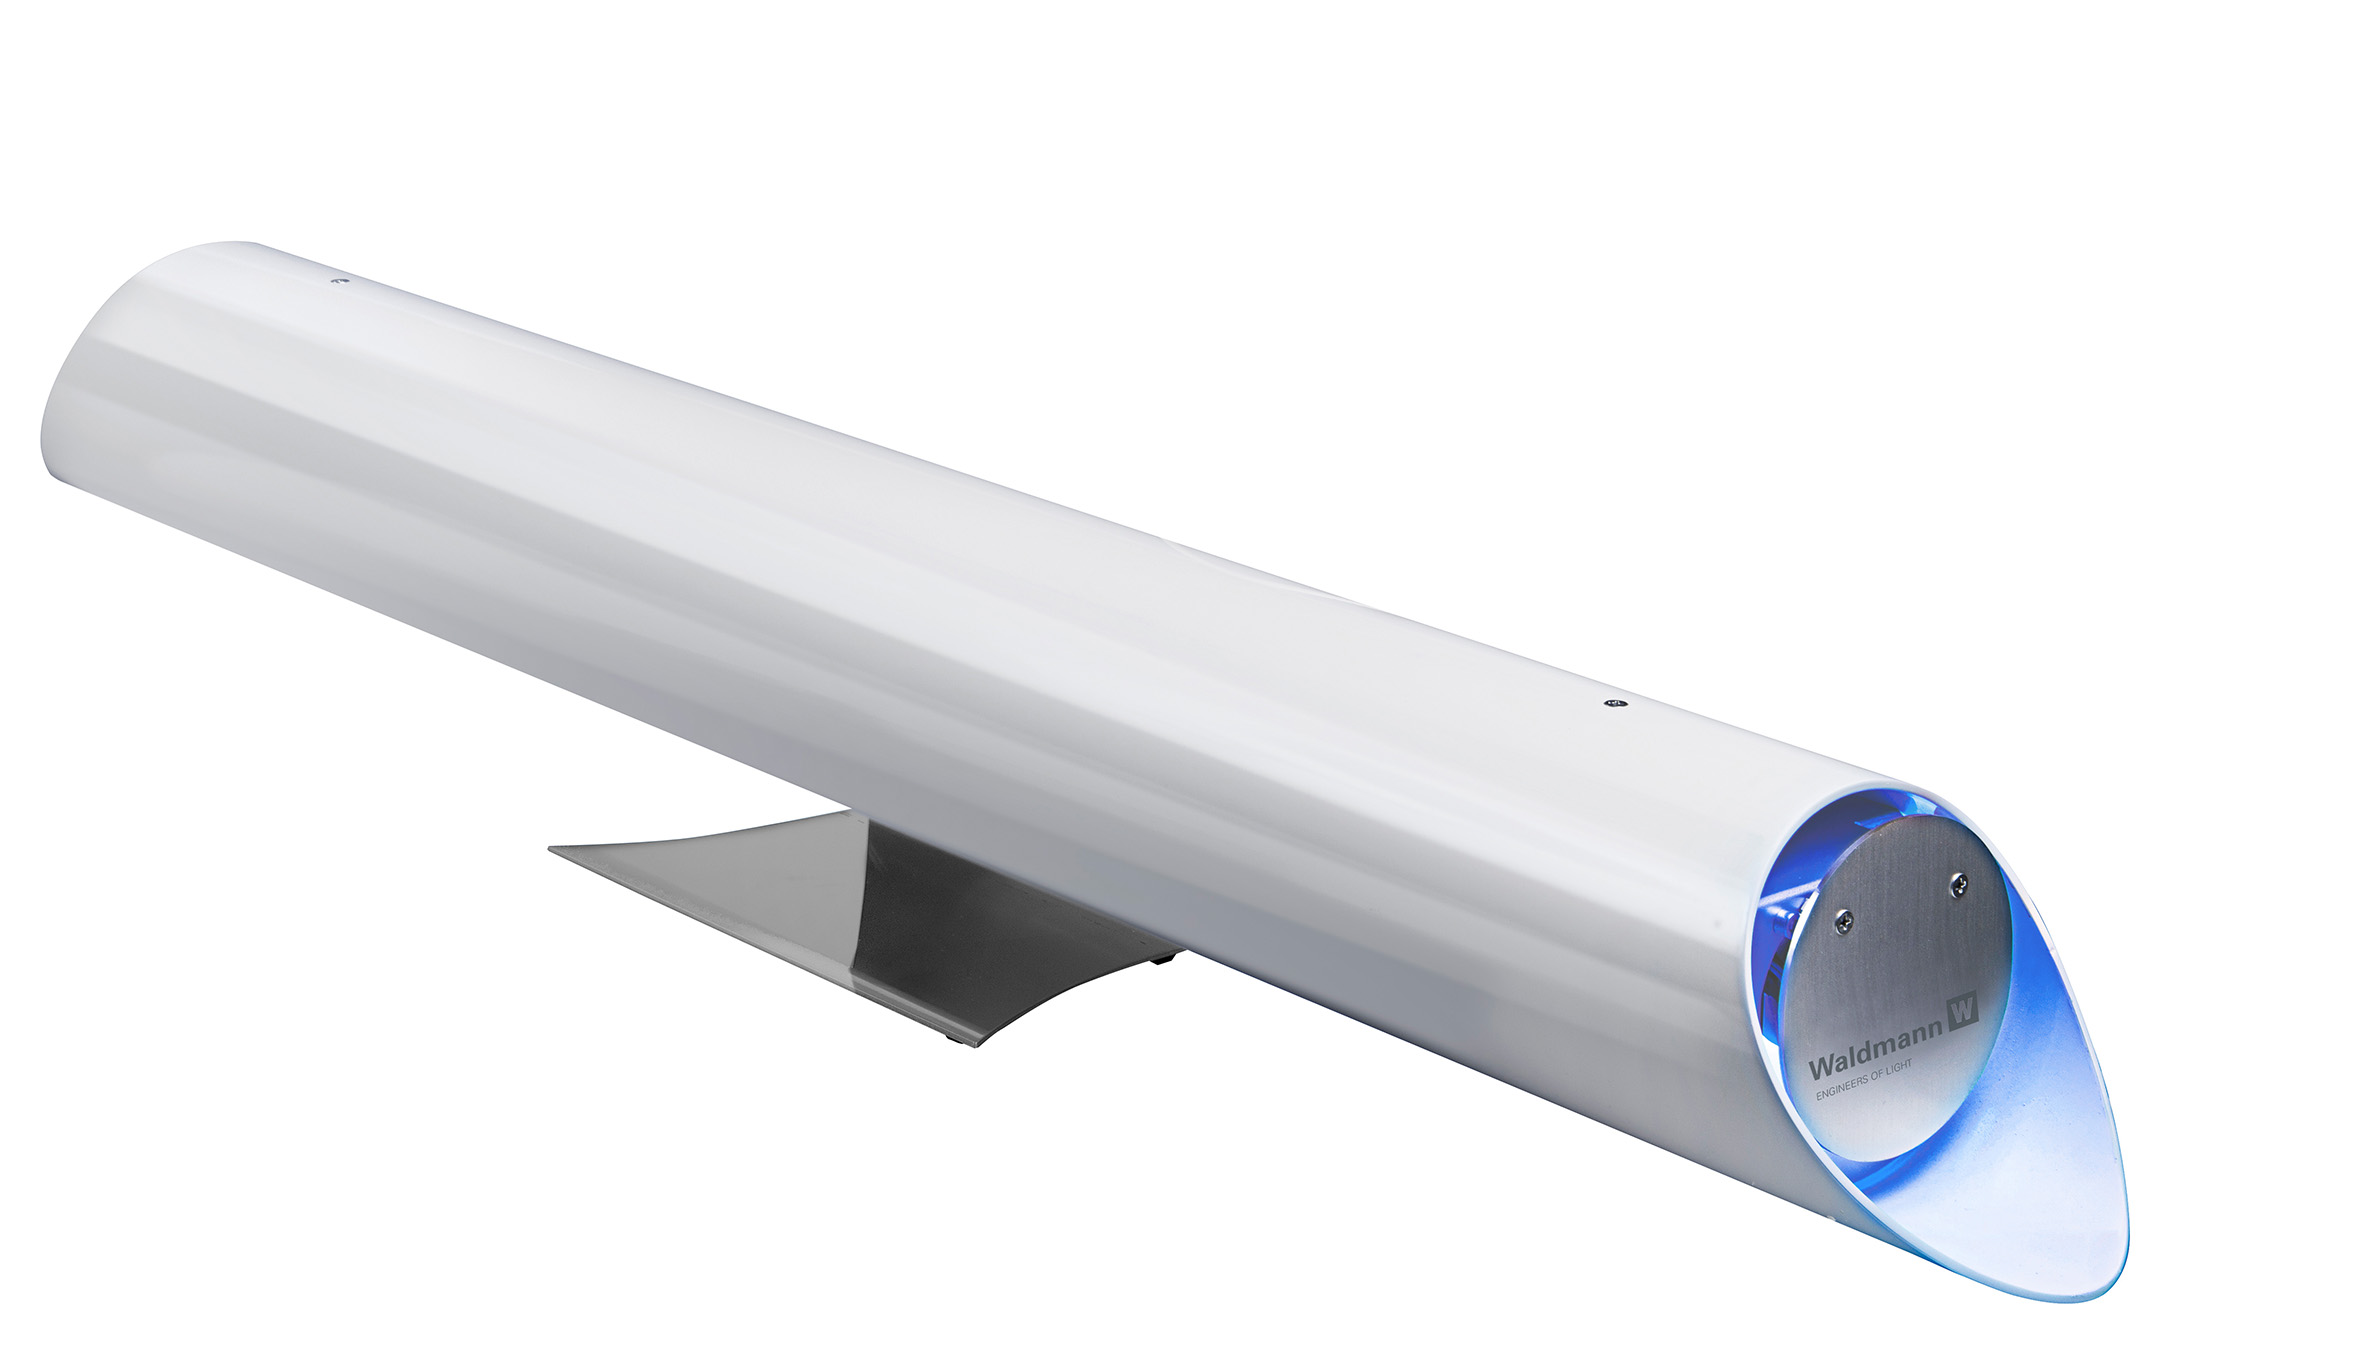 WALDMANN UV-C Desinfectielamp Zapp 58 Watt